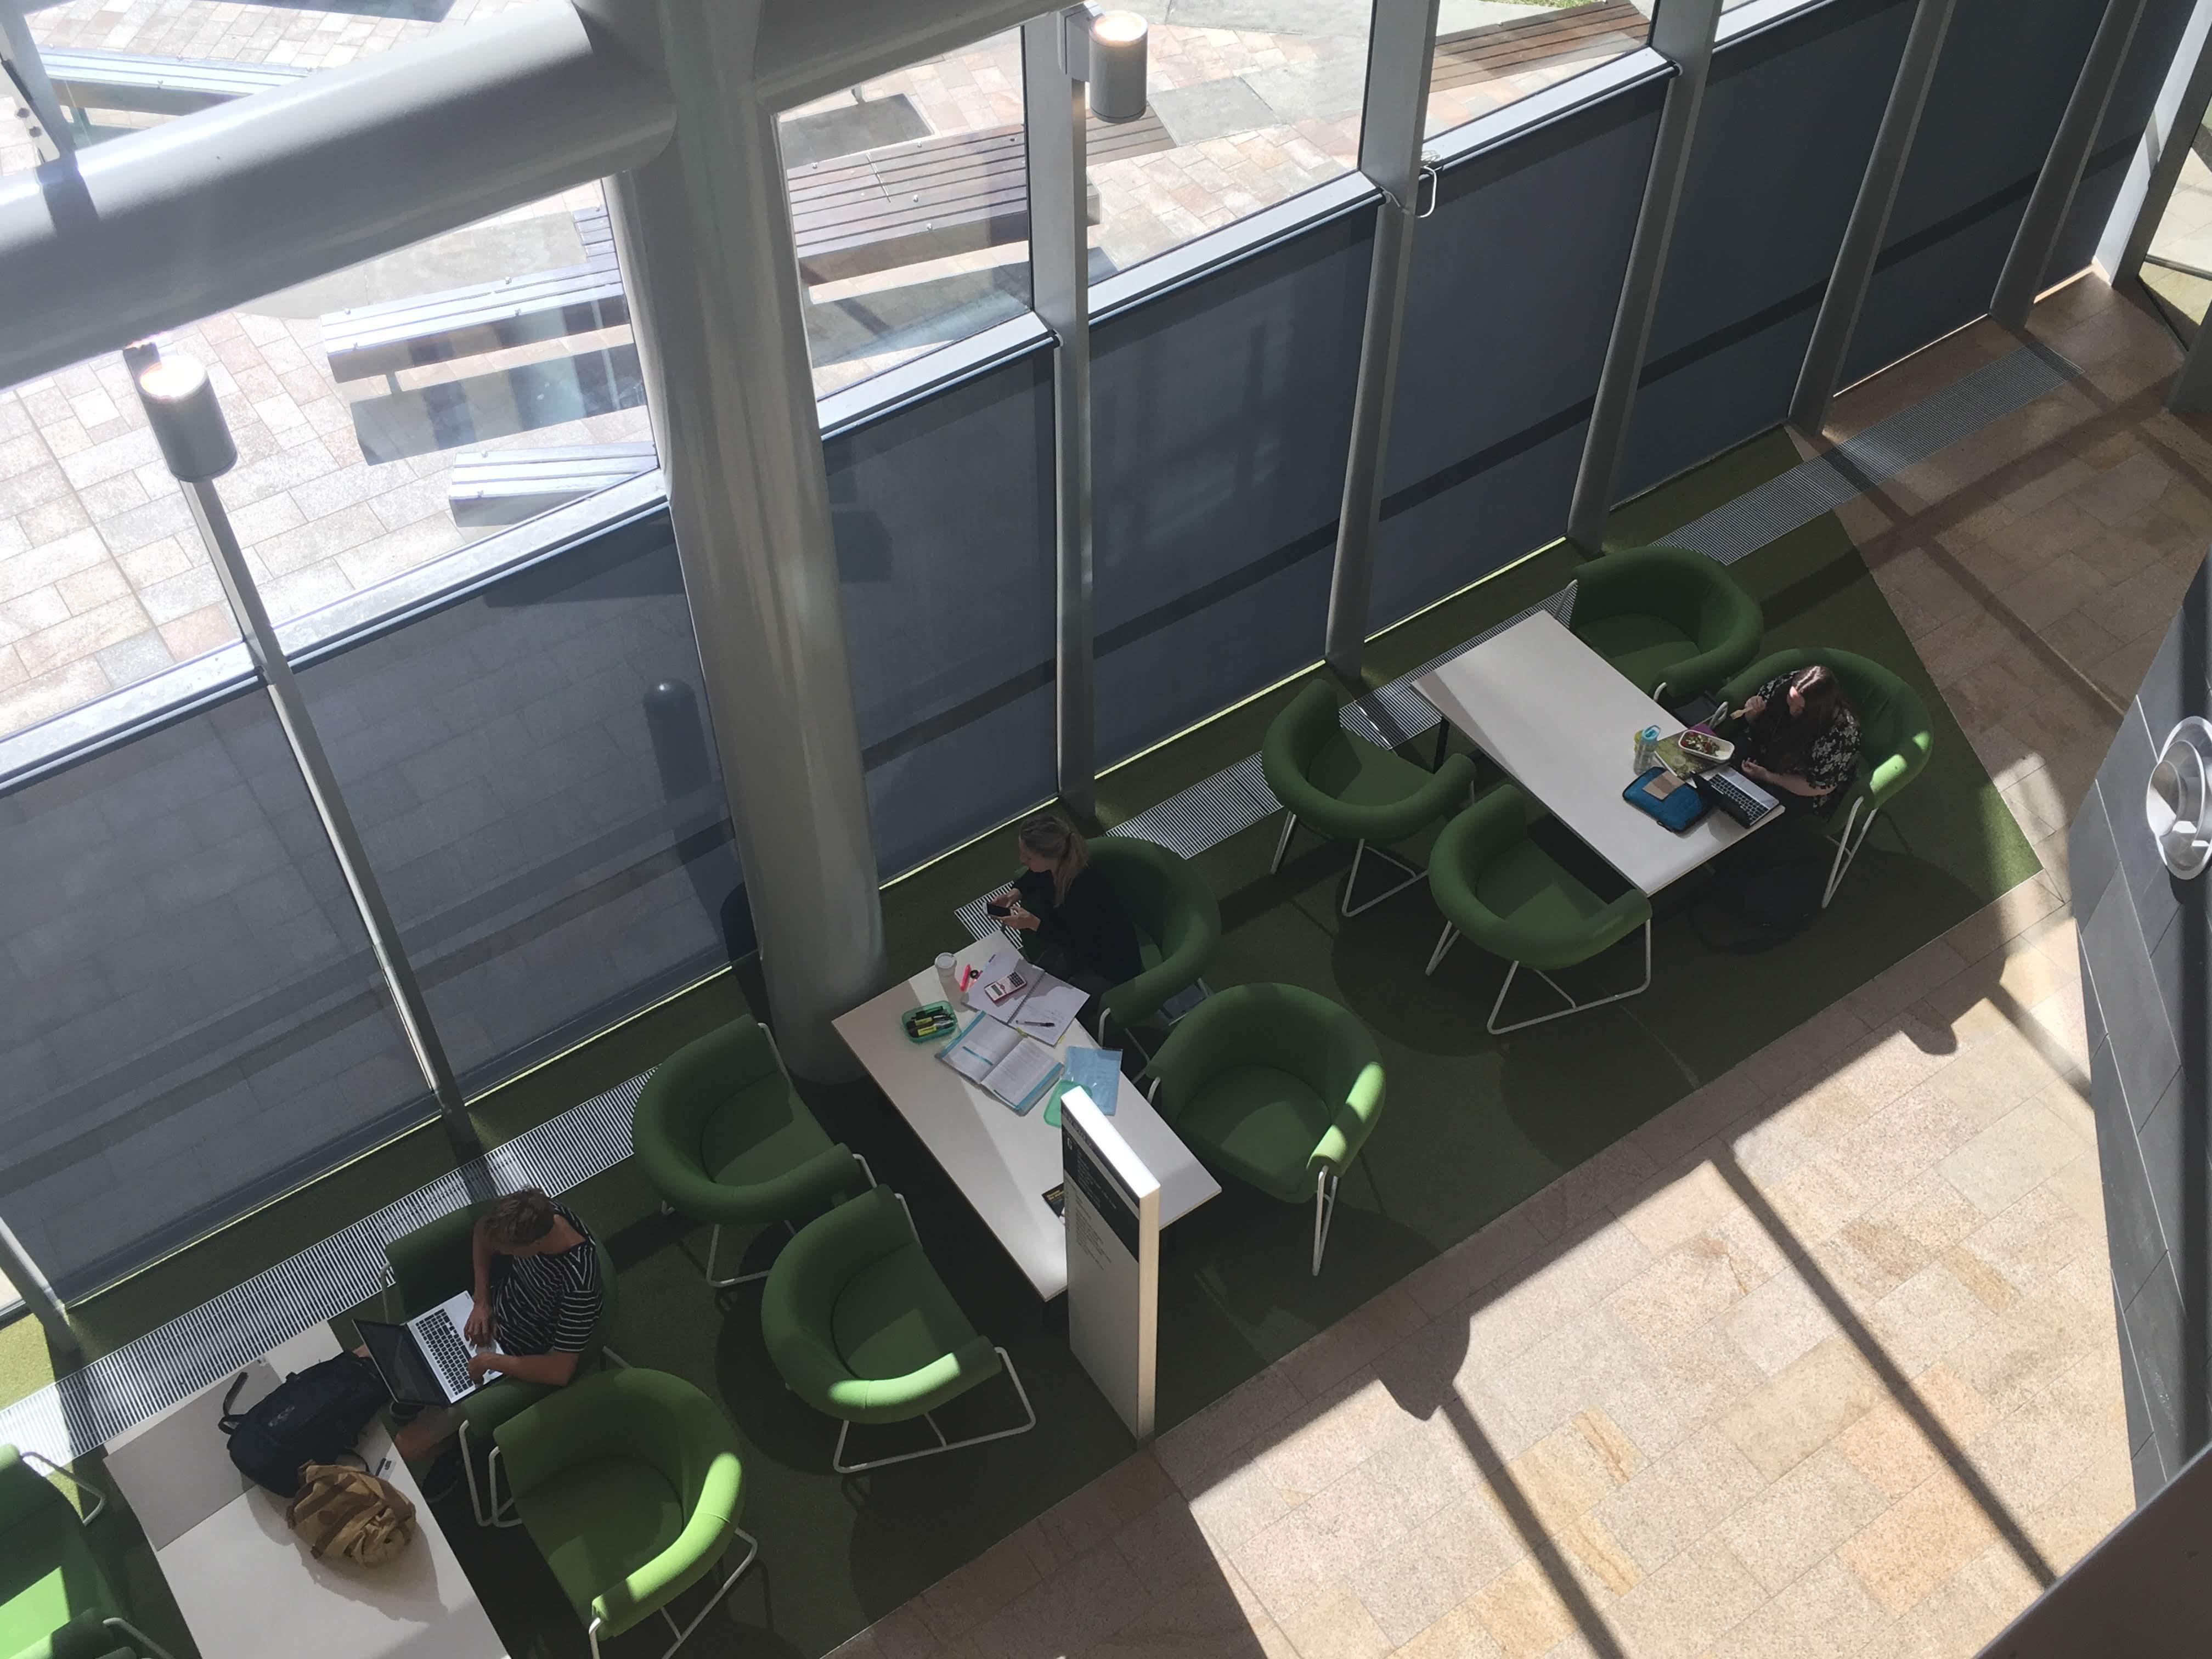 University of Newcastle - campus photos - 5